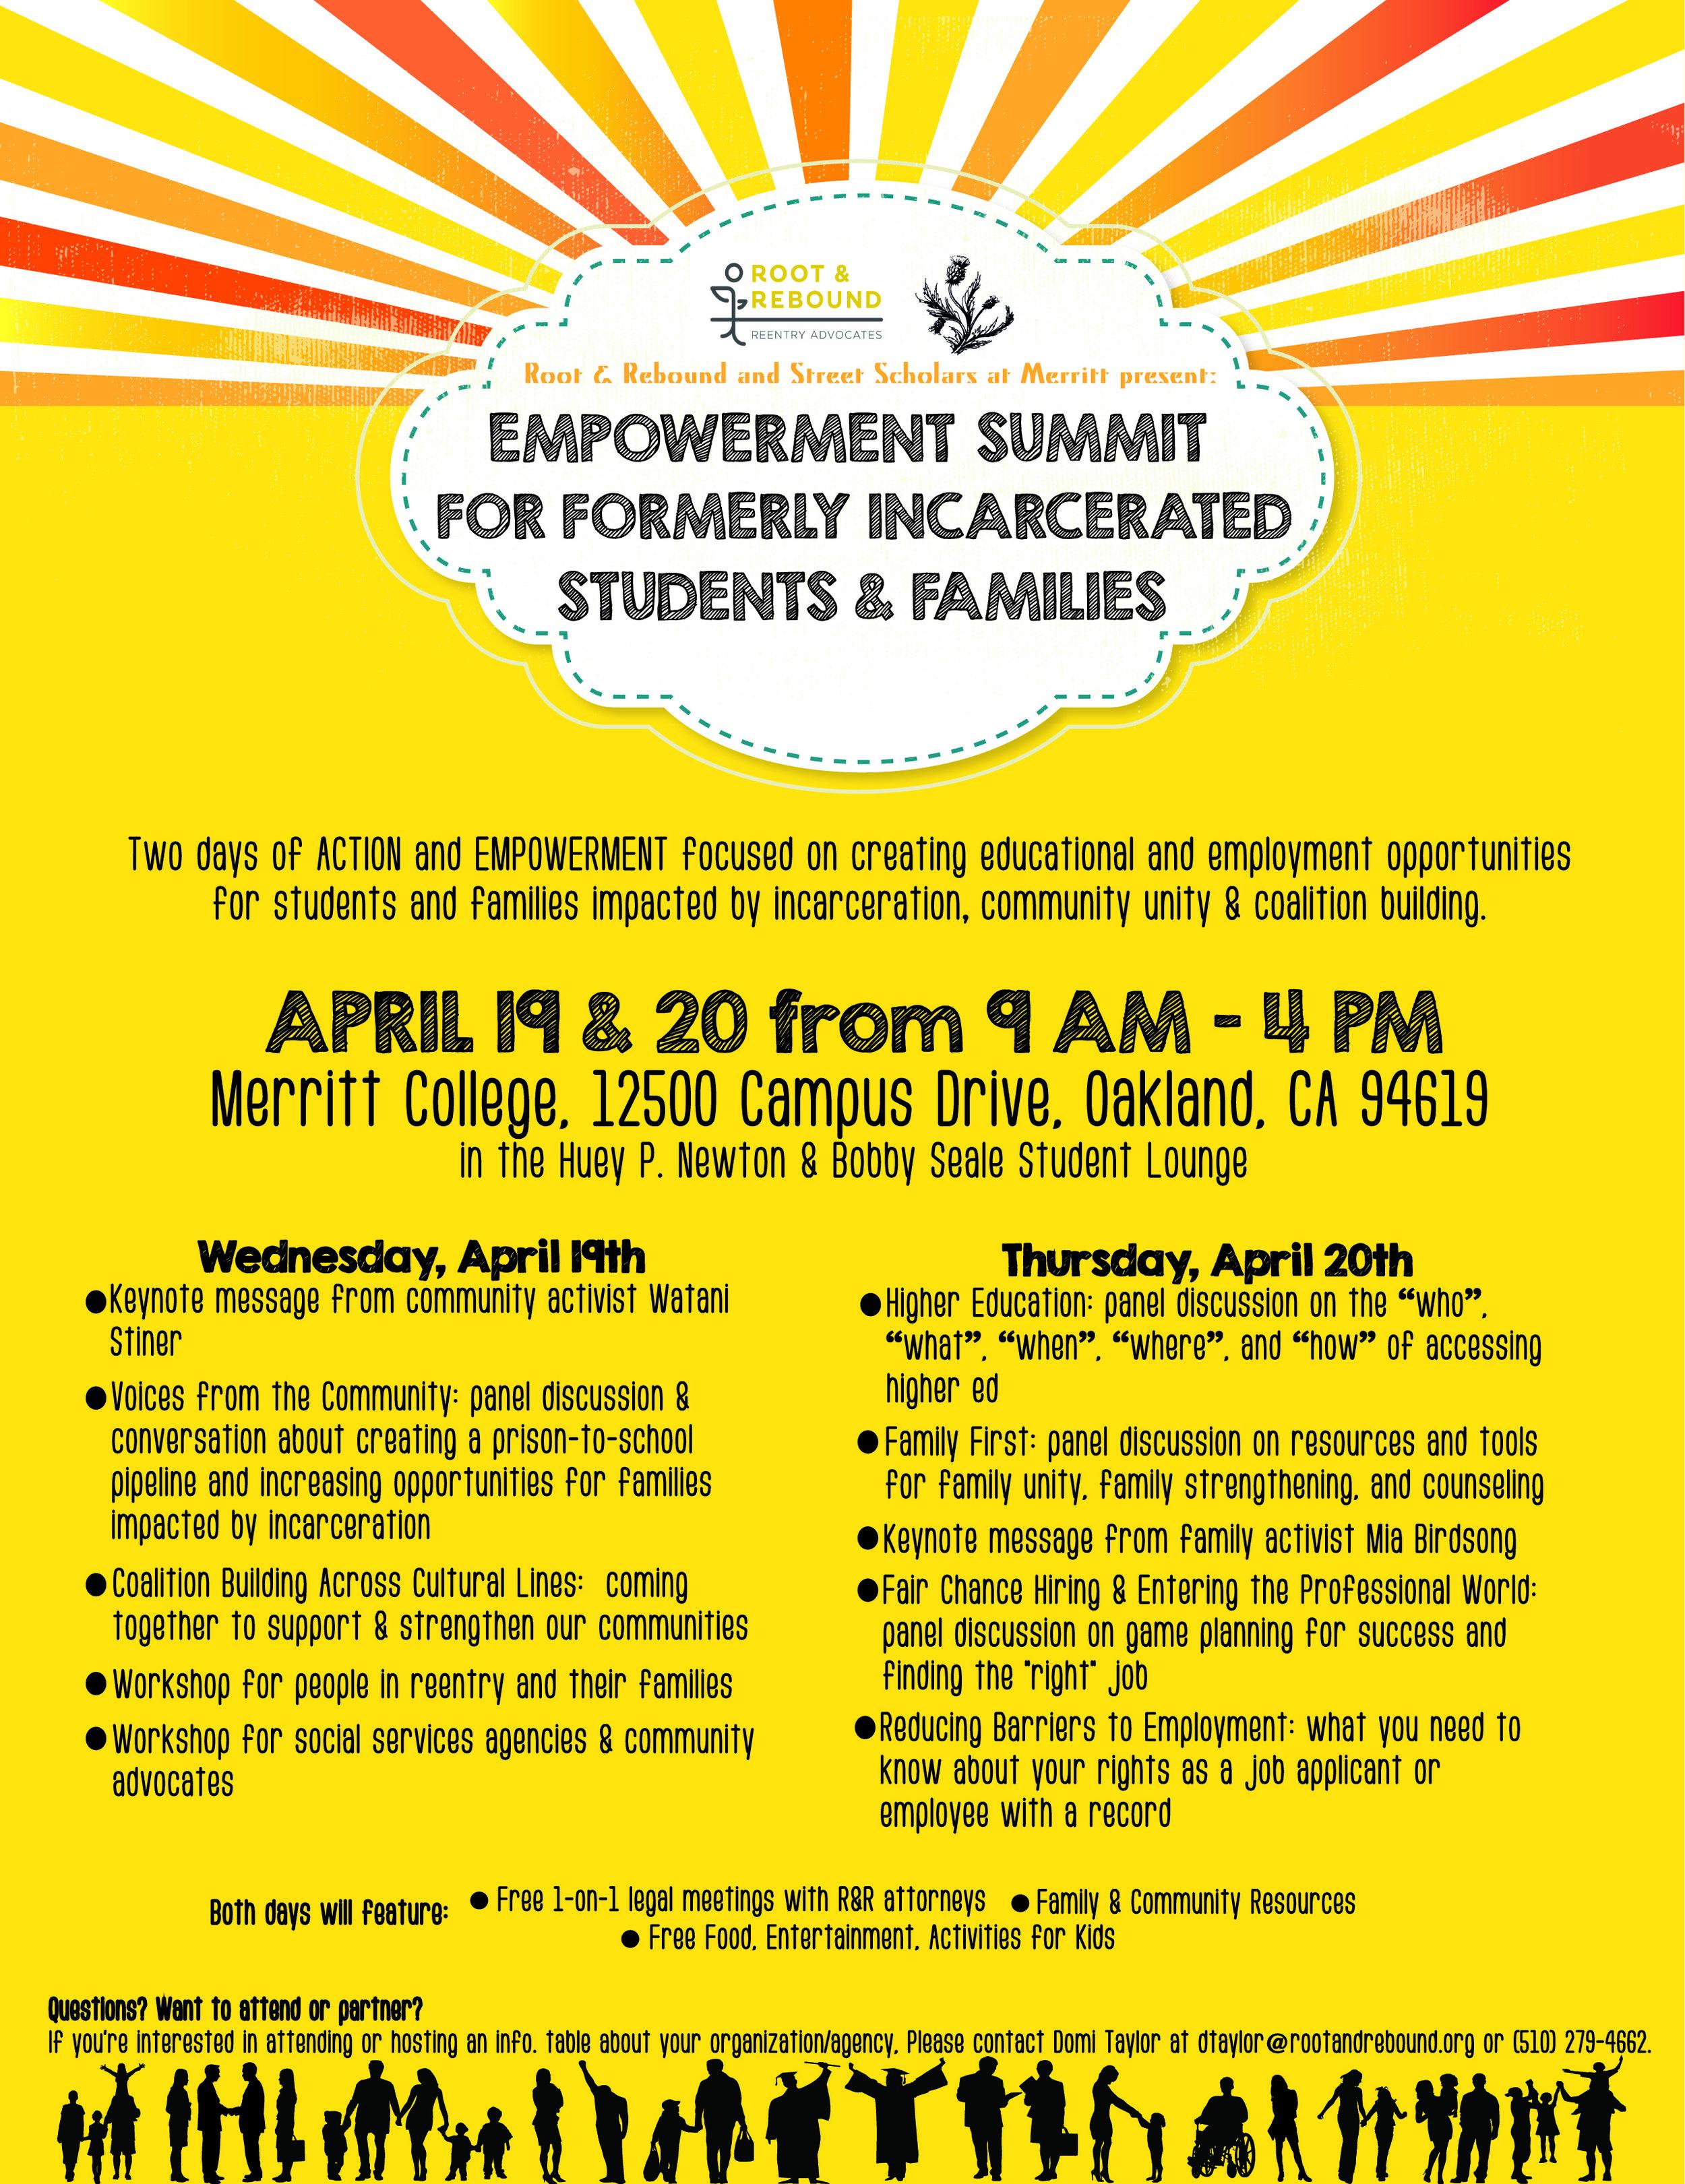 Final Empowerment Summit Flyer.jpg